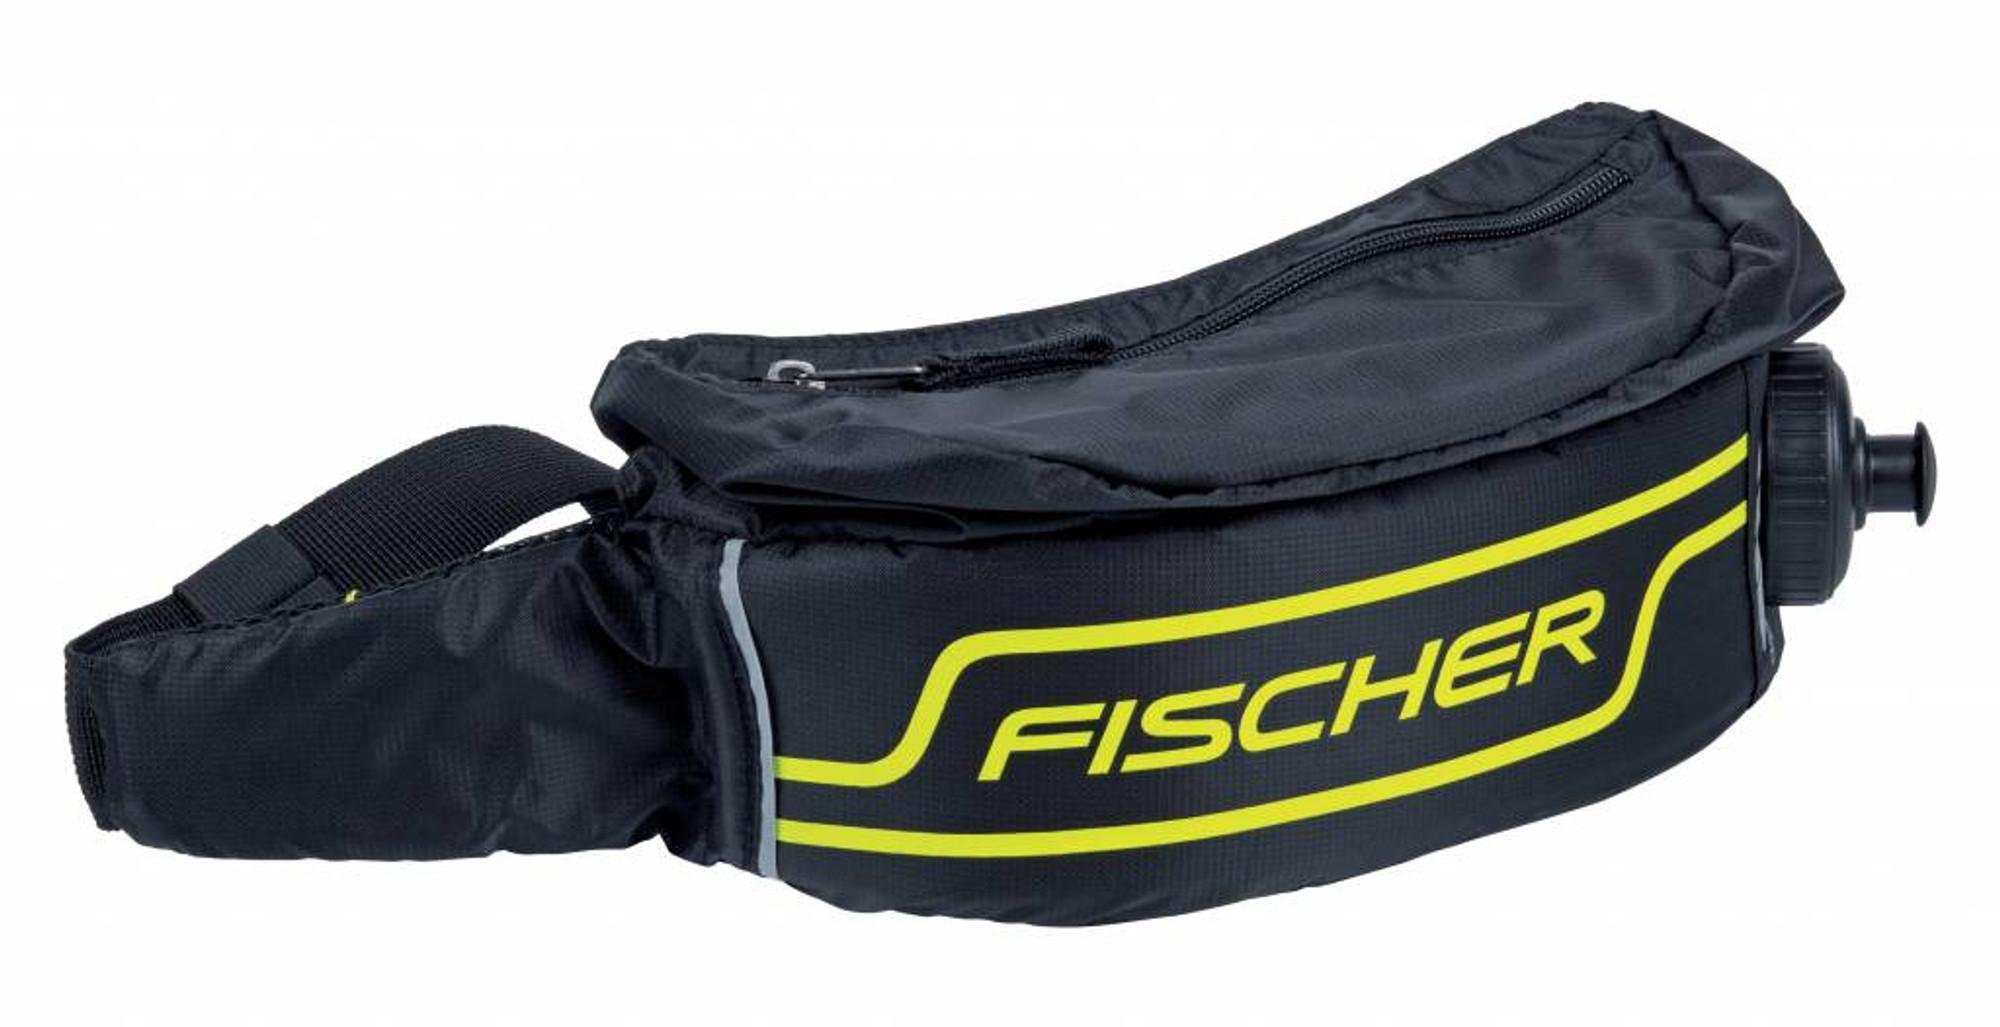 cb0ddff233c Fischer Drink Belt Professional - RollerskiShop.com LLC